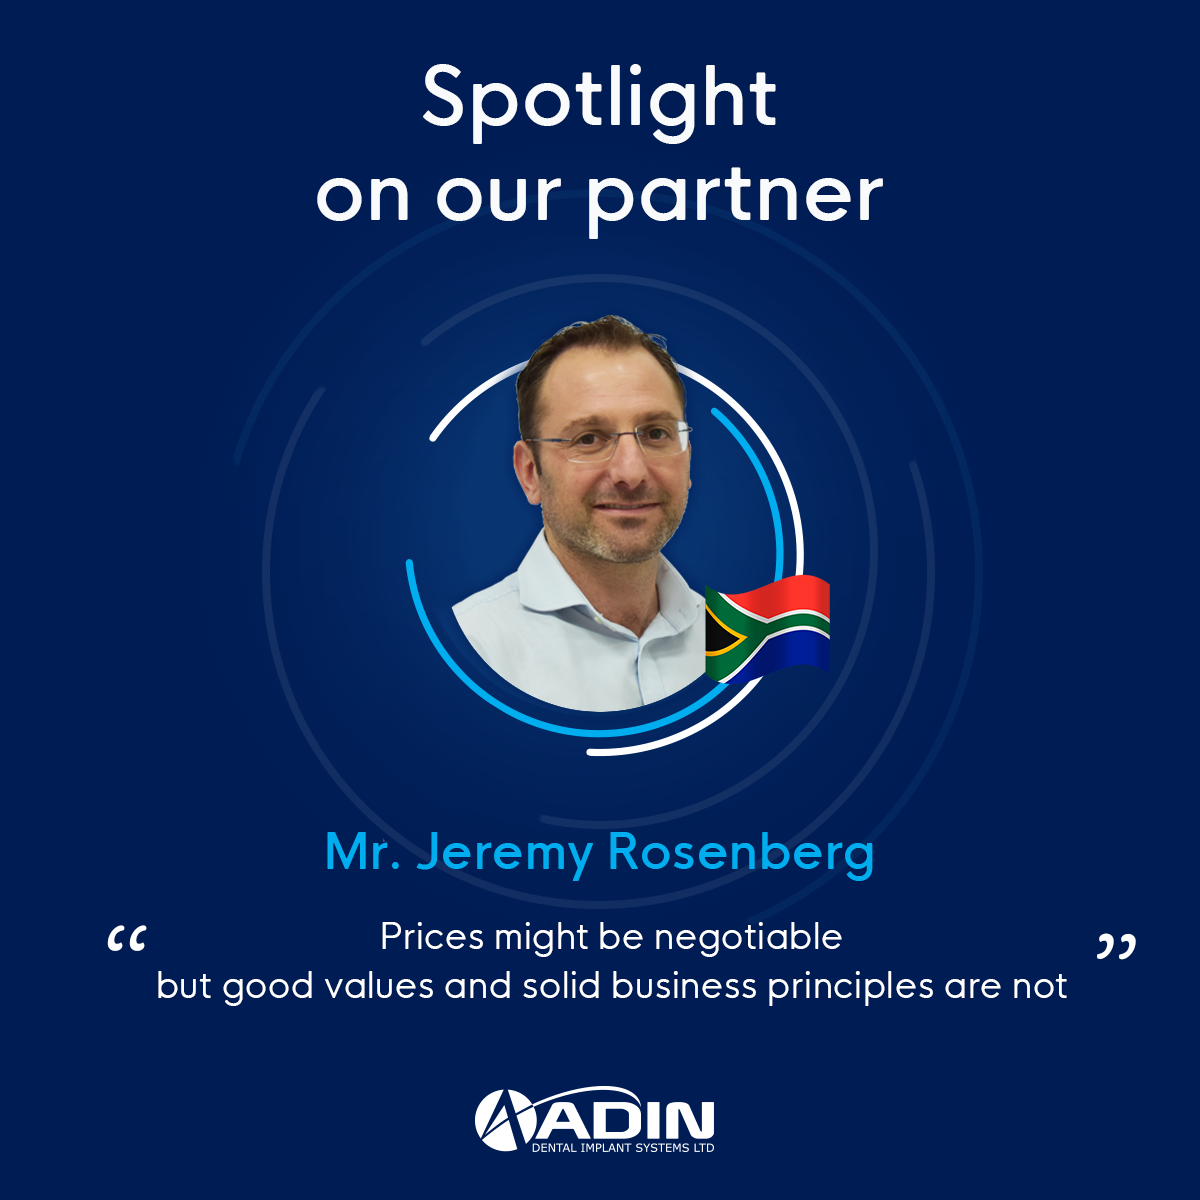 Spotlight on our partner Mr. Jeremy Rosenberg, South Africa